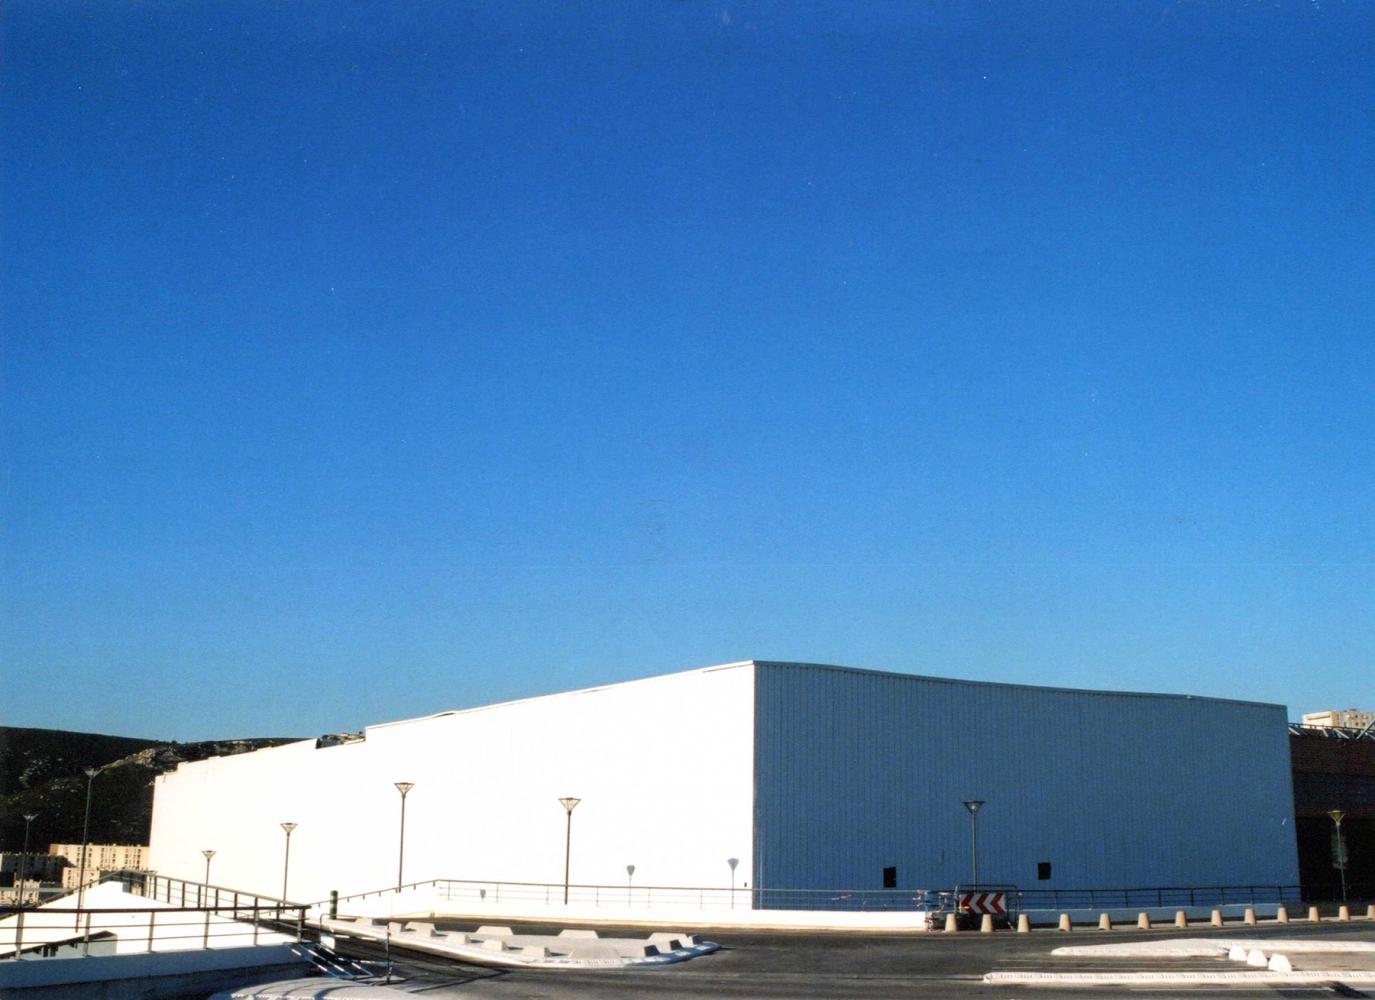 Le Palais - 2004